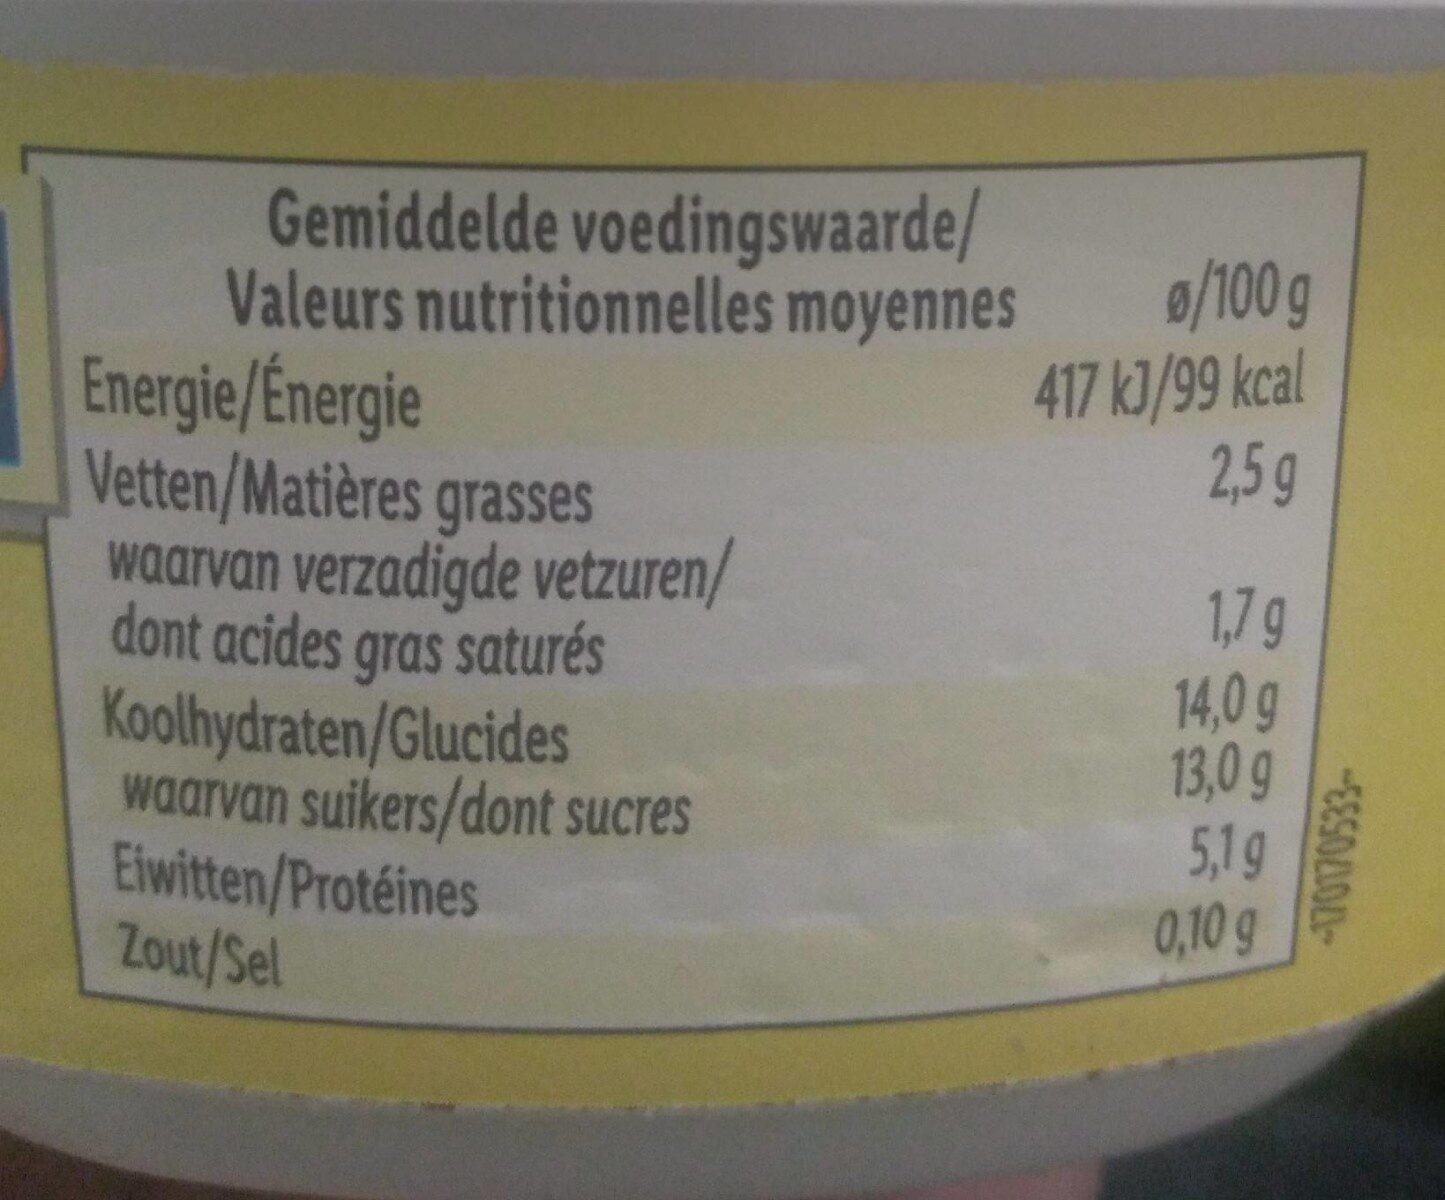 Fromage frais vanille - Informations nutritionnelles - fr